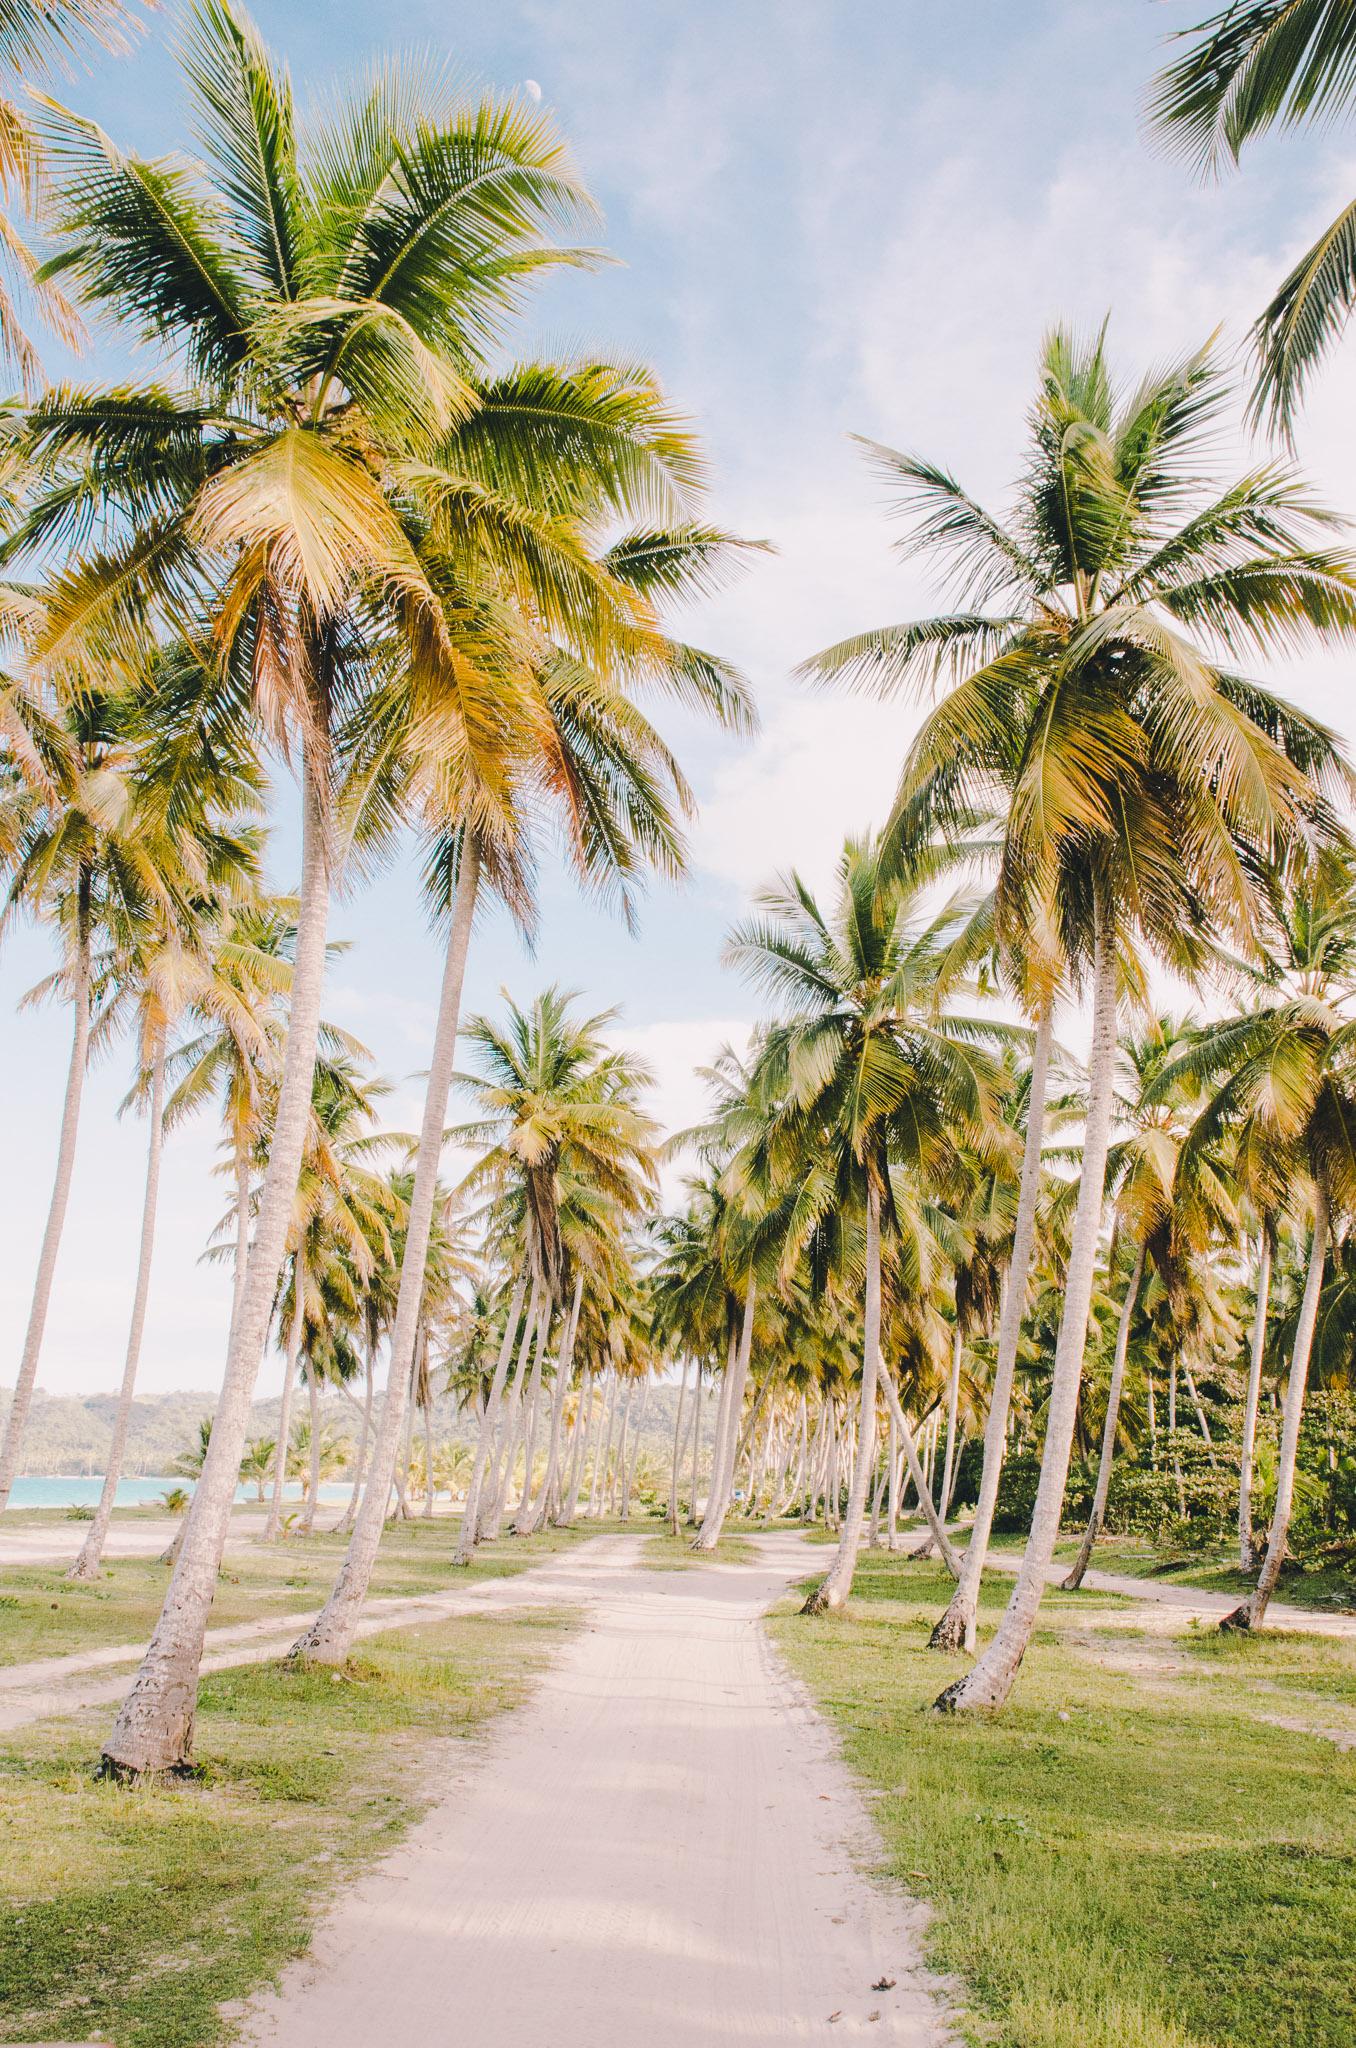 dominican-republic-9.jpg